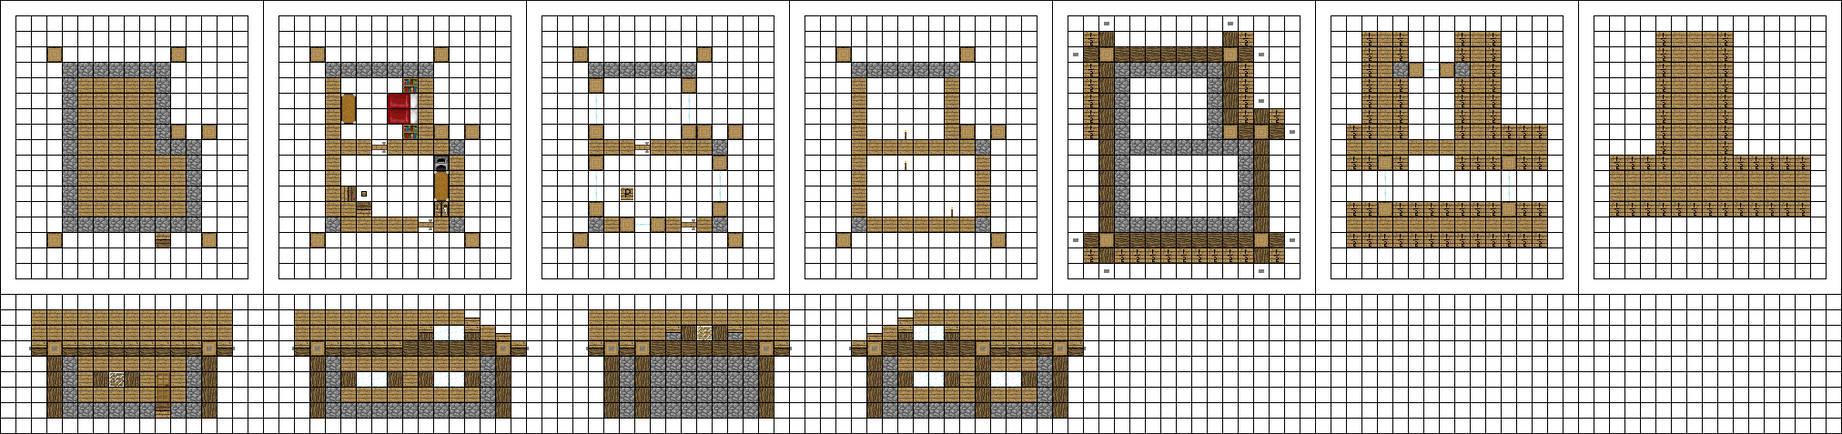 Alternate Large House